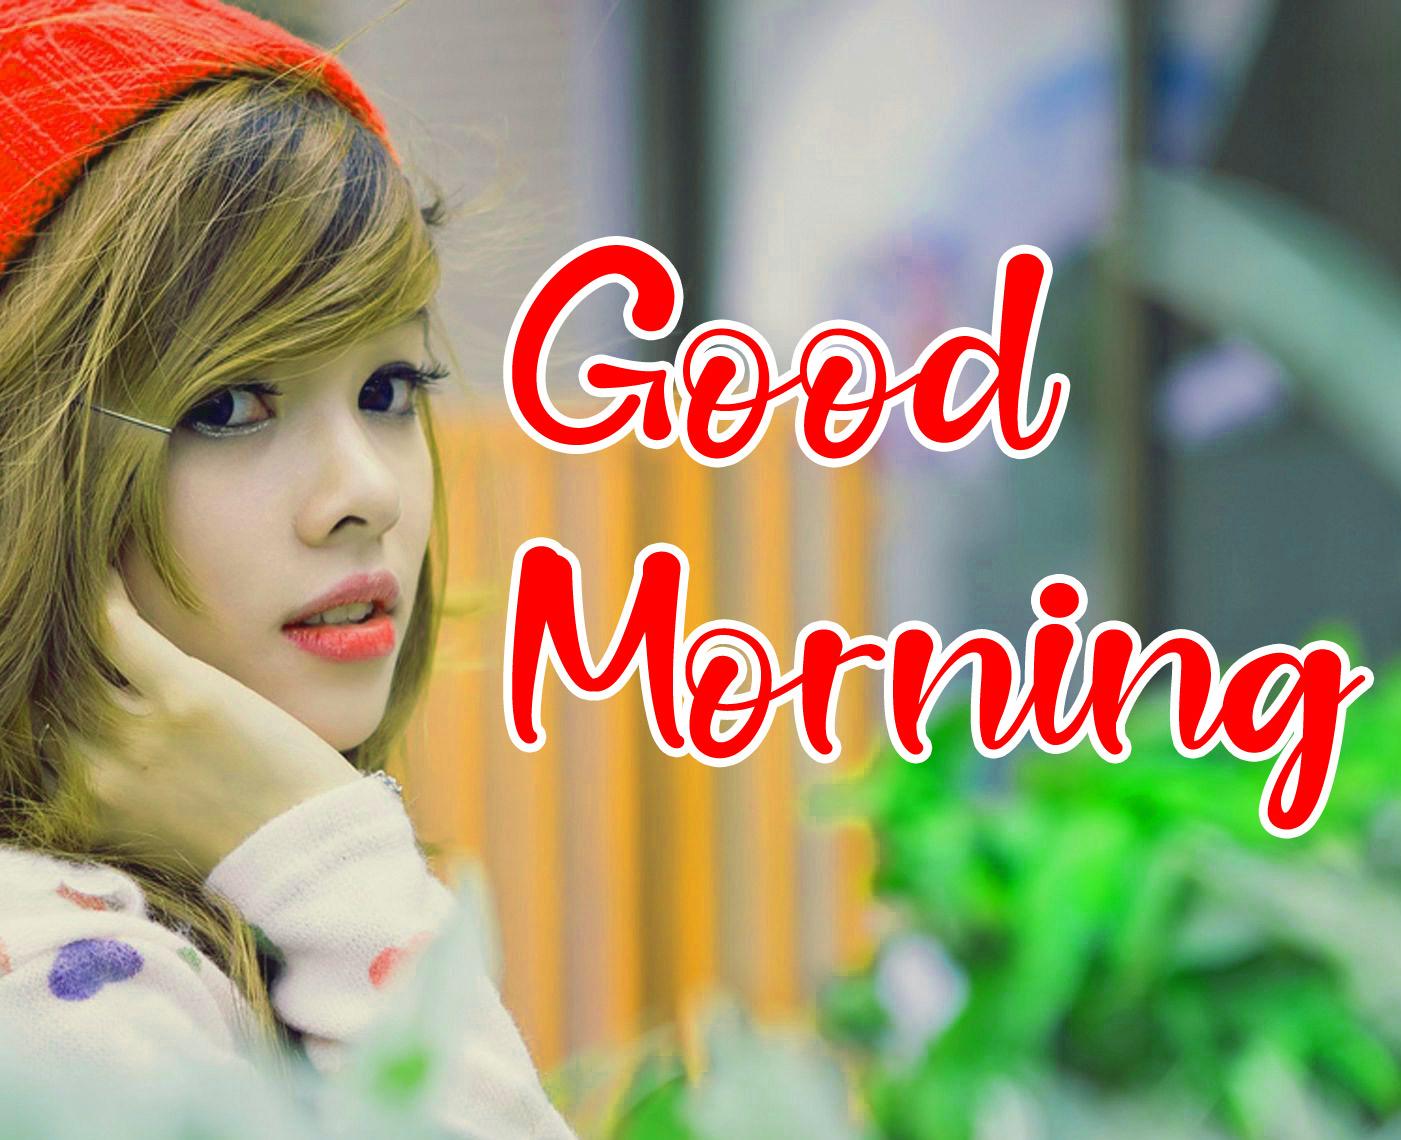 good morning Images for girls 7